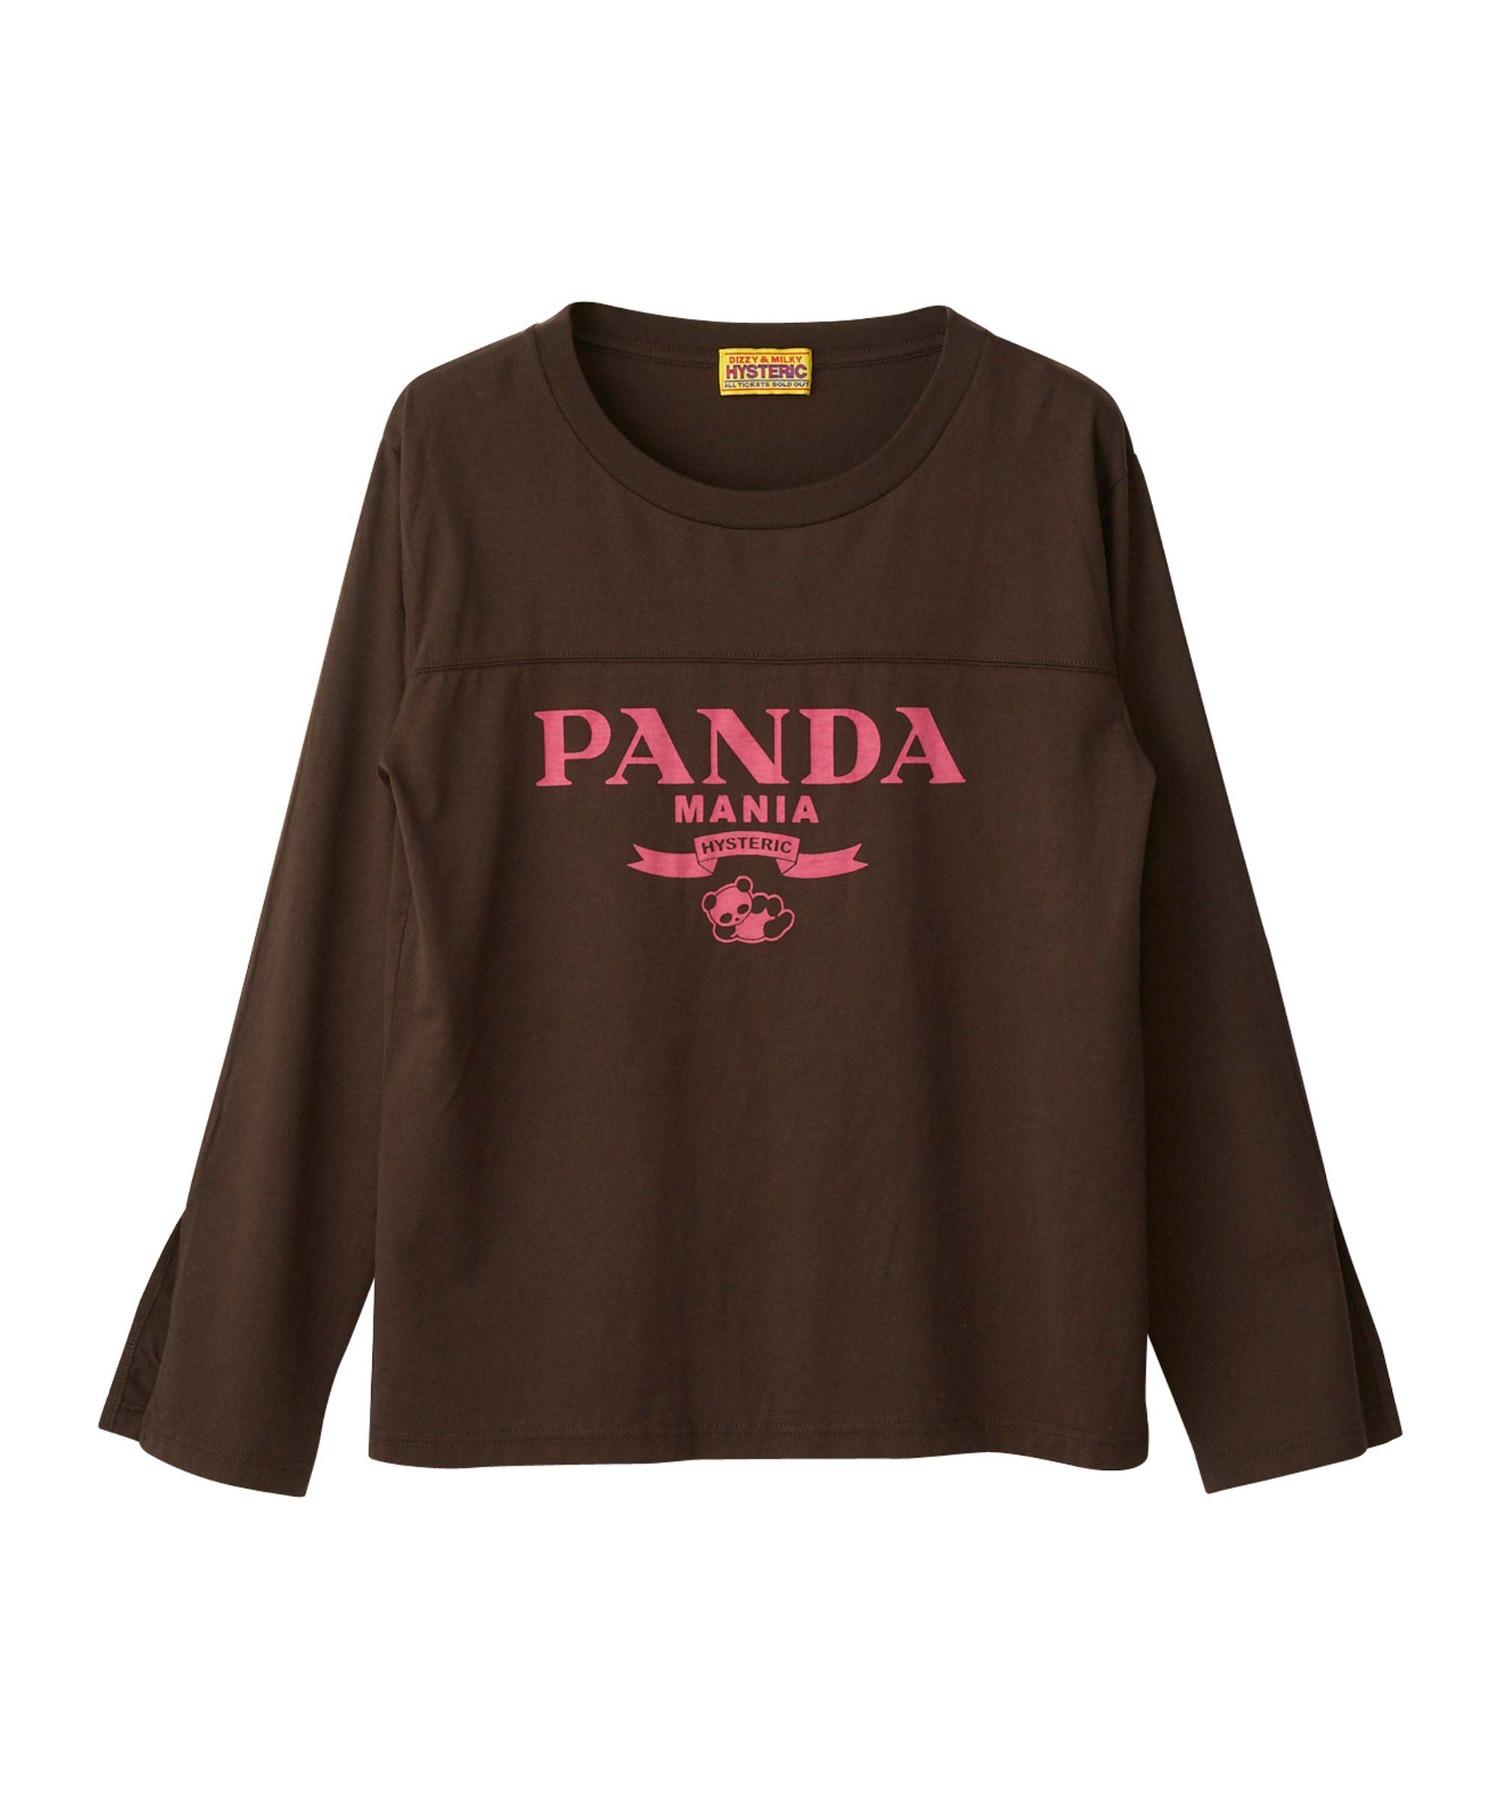 PANDA MANIA Tシャツ